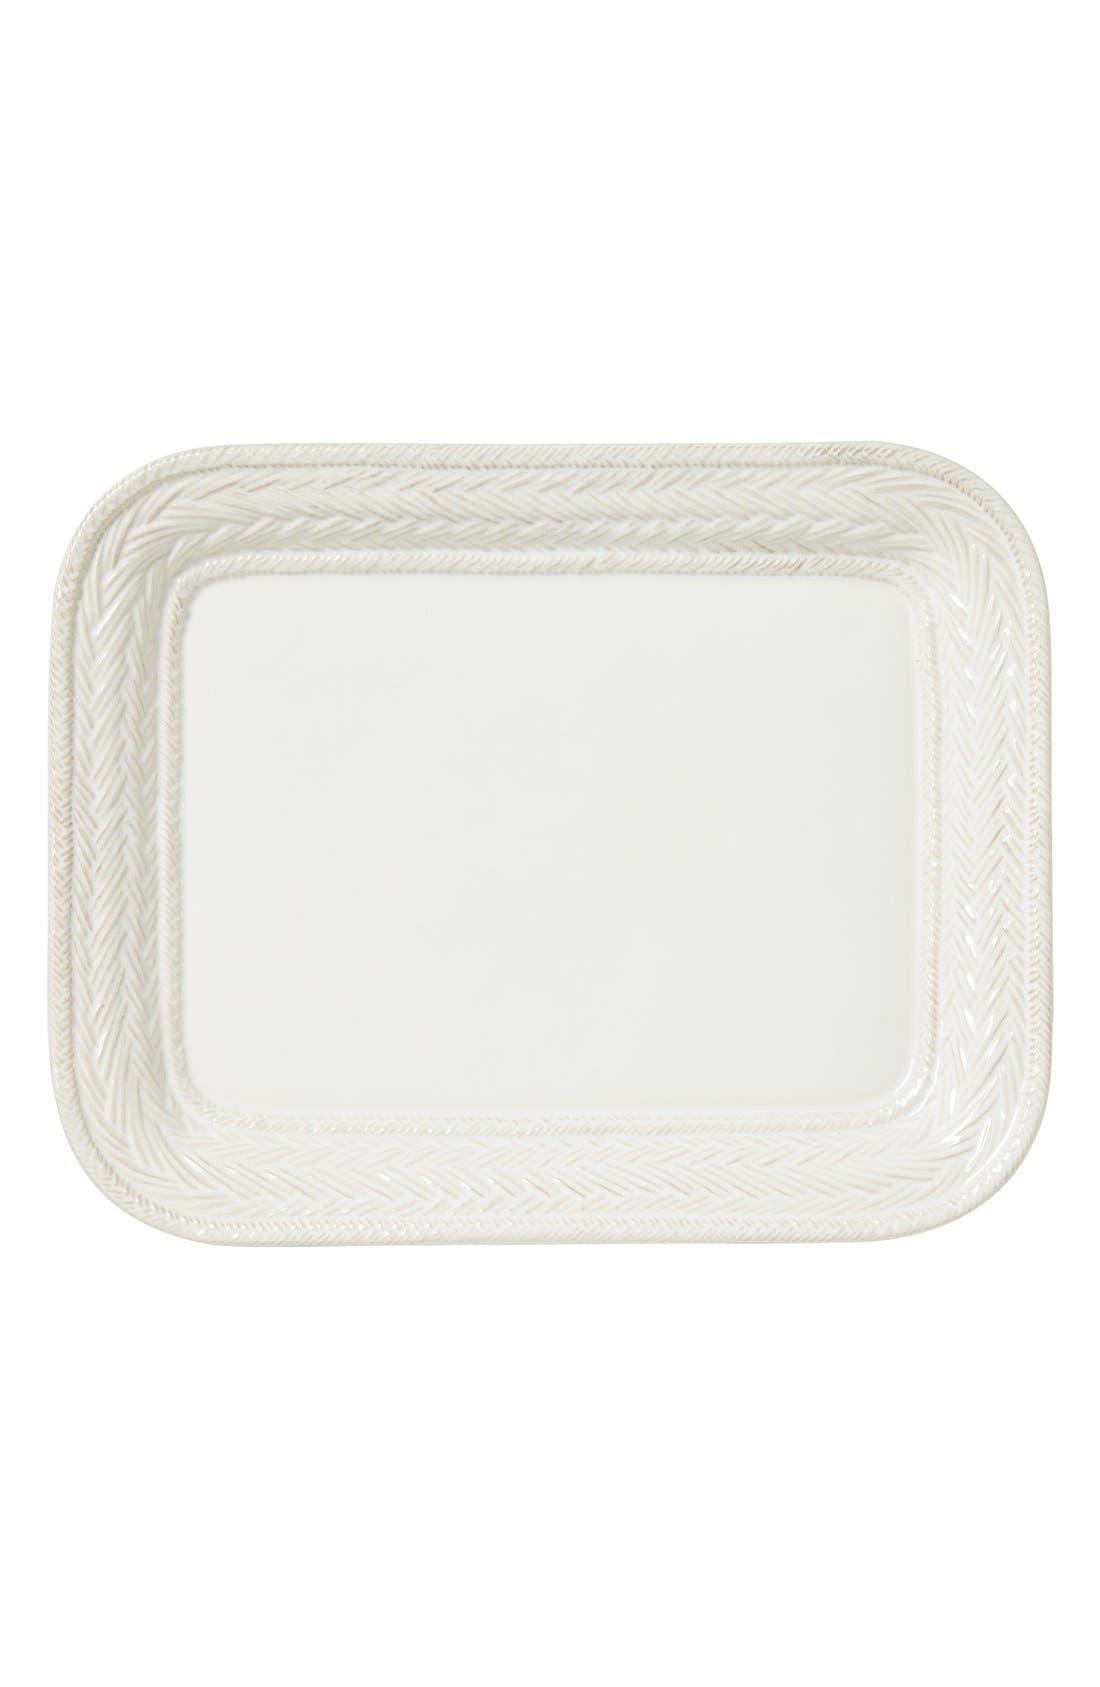 Juliska Le Panier Large Ceramic Platter